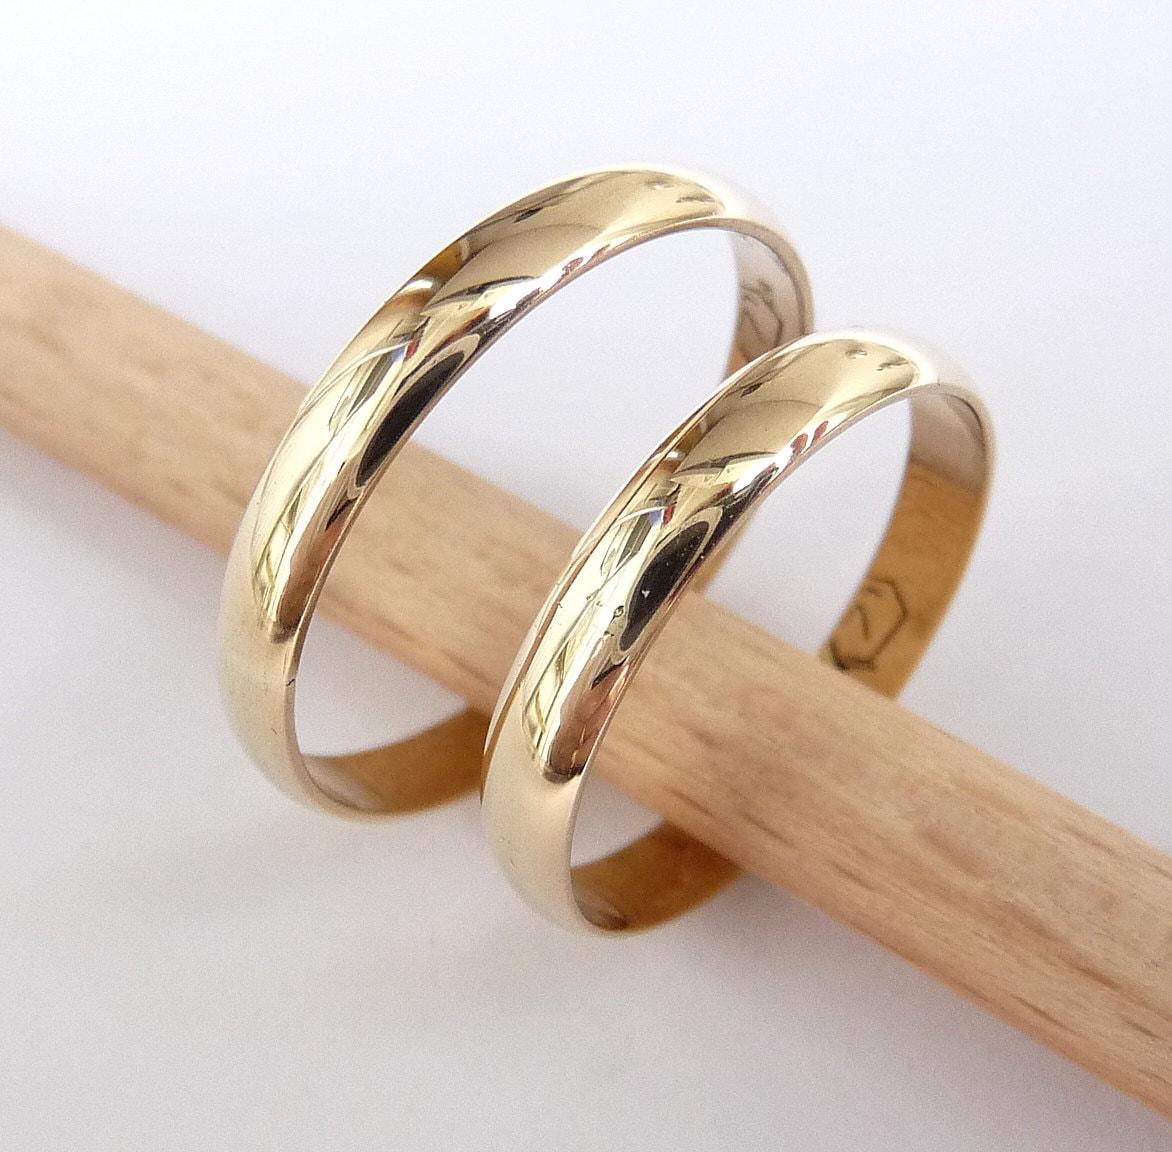 Wedding bands set 14k gold women men rings 3mm wide by 1mm